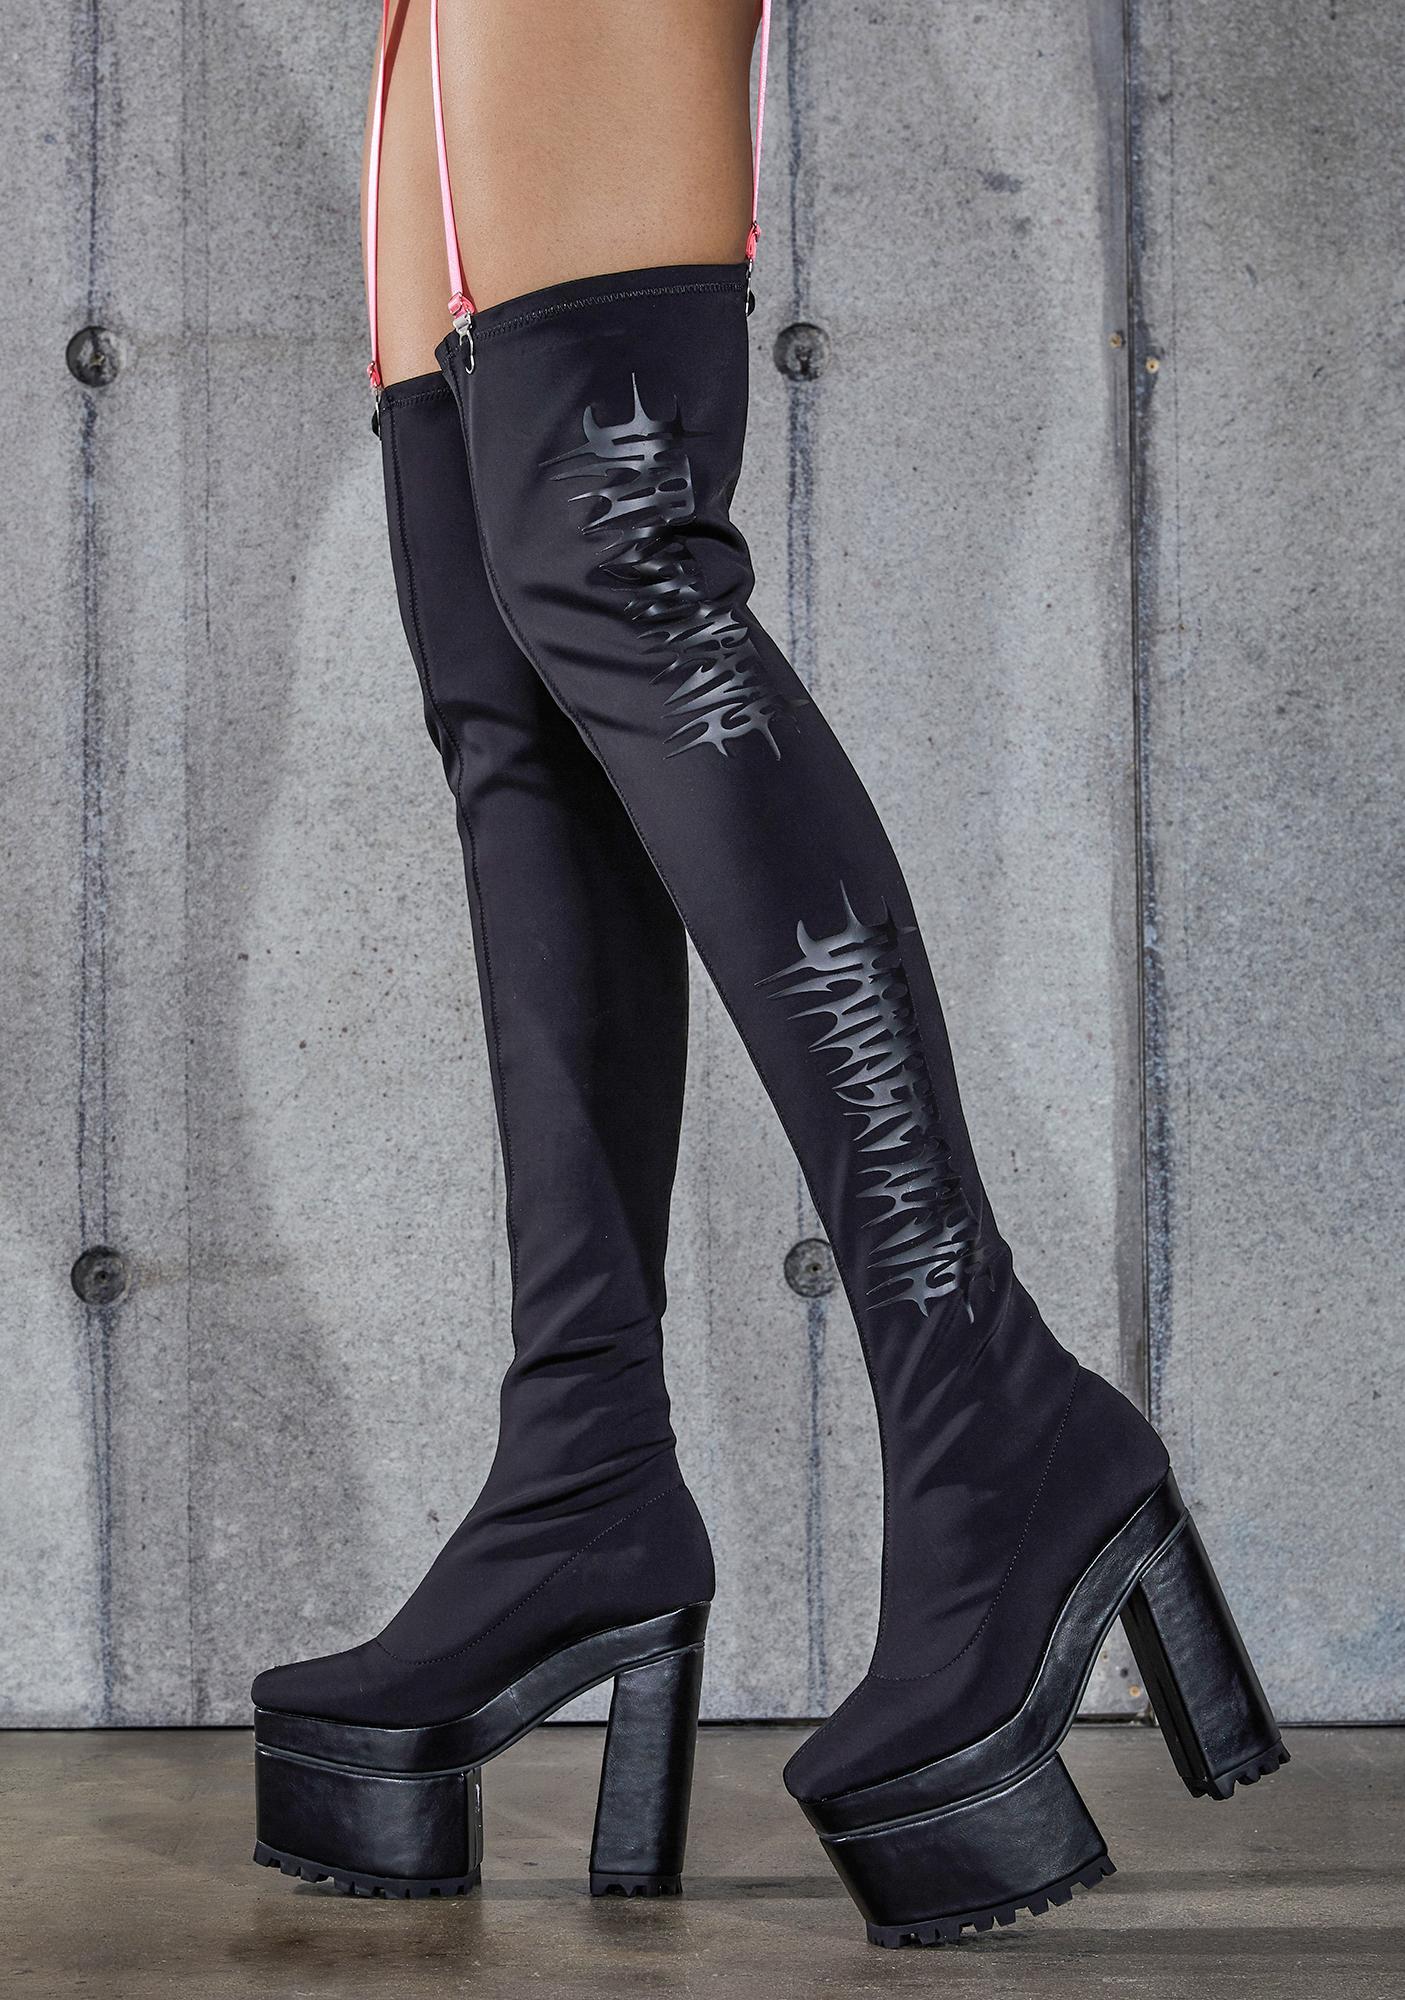 DARKER WAVS Snare Logo Stretch Thigh High Platform Boots